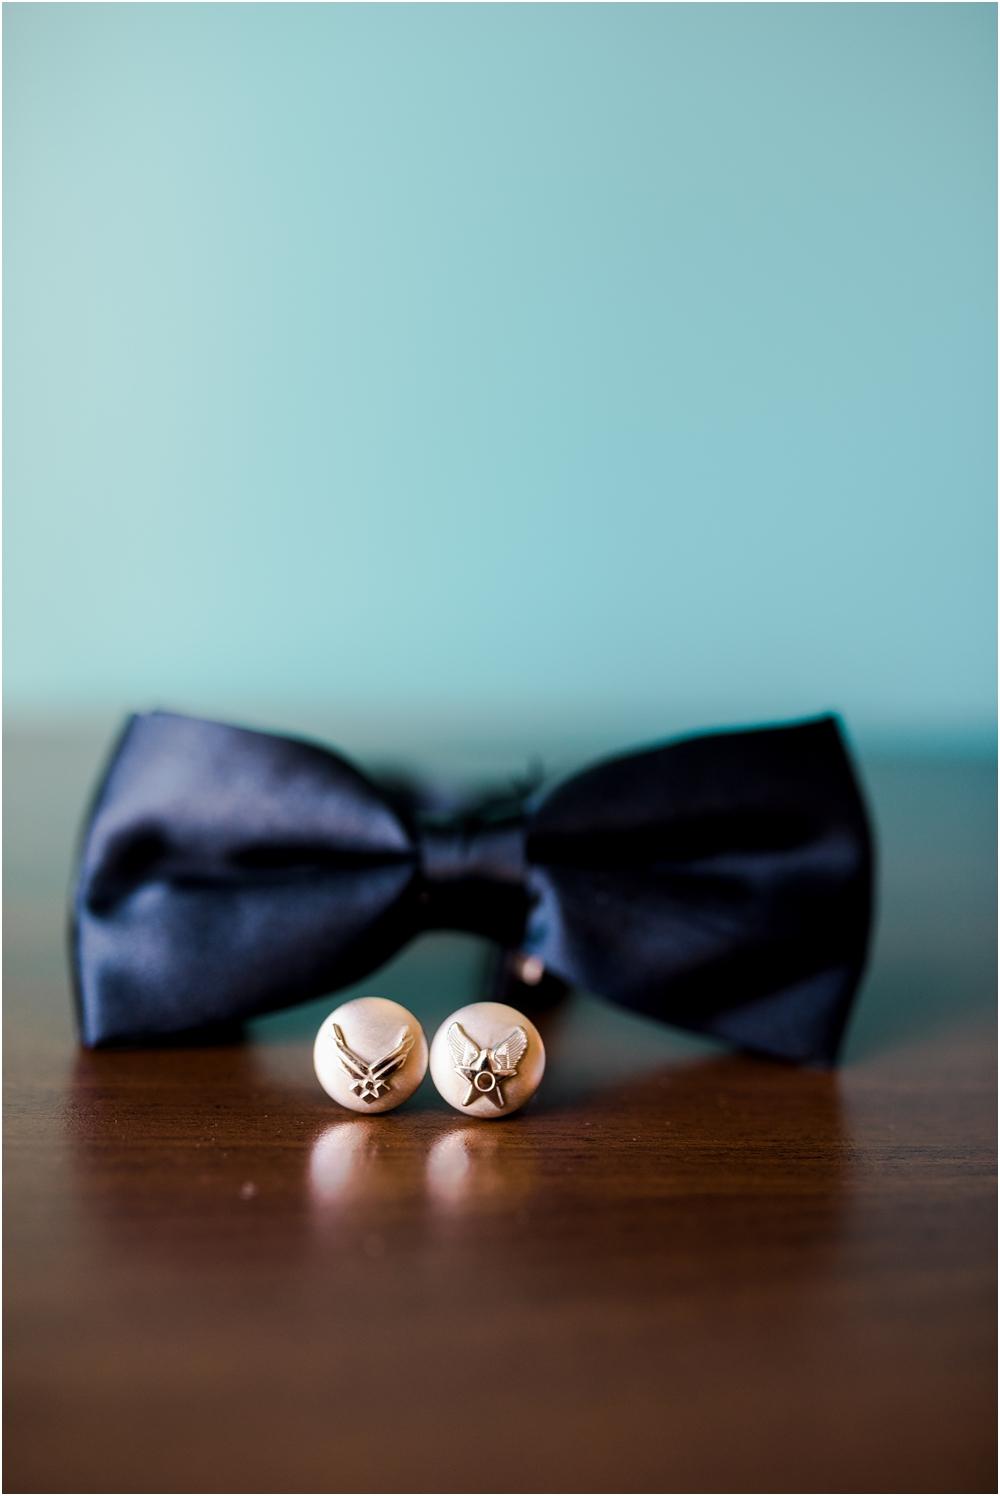 amack-wedding-kiersten-stevenson-photography-30a-panama-city-beach-dothan-tallahassee-(66-of-882).JPG